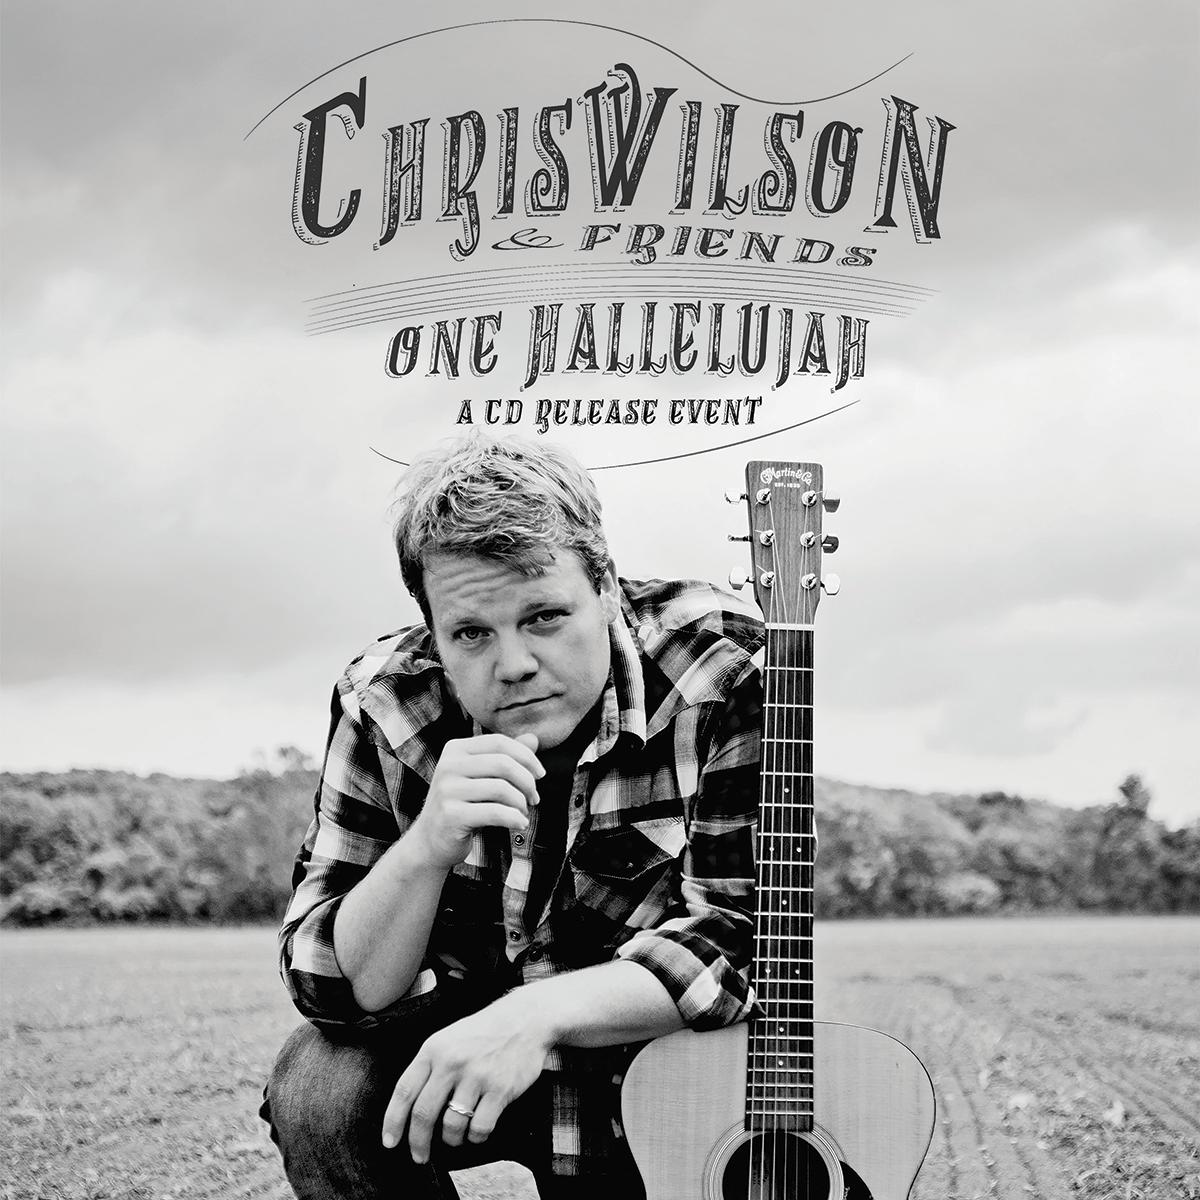 chris wilson event poster lyric website.png